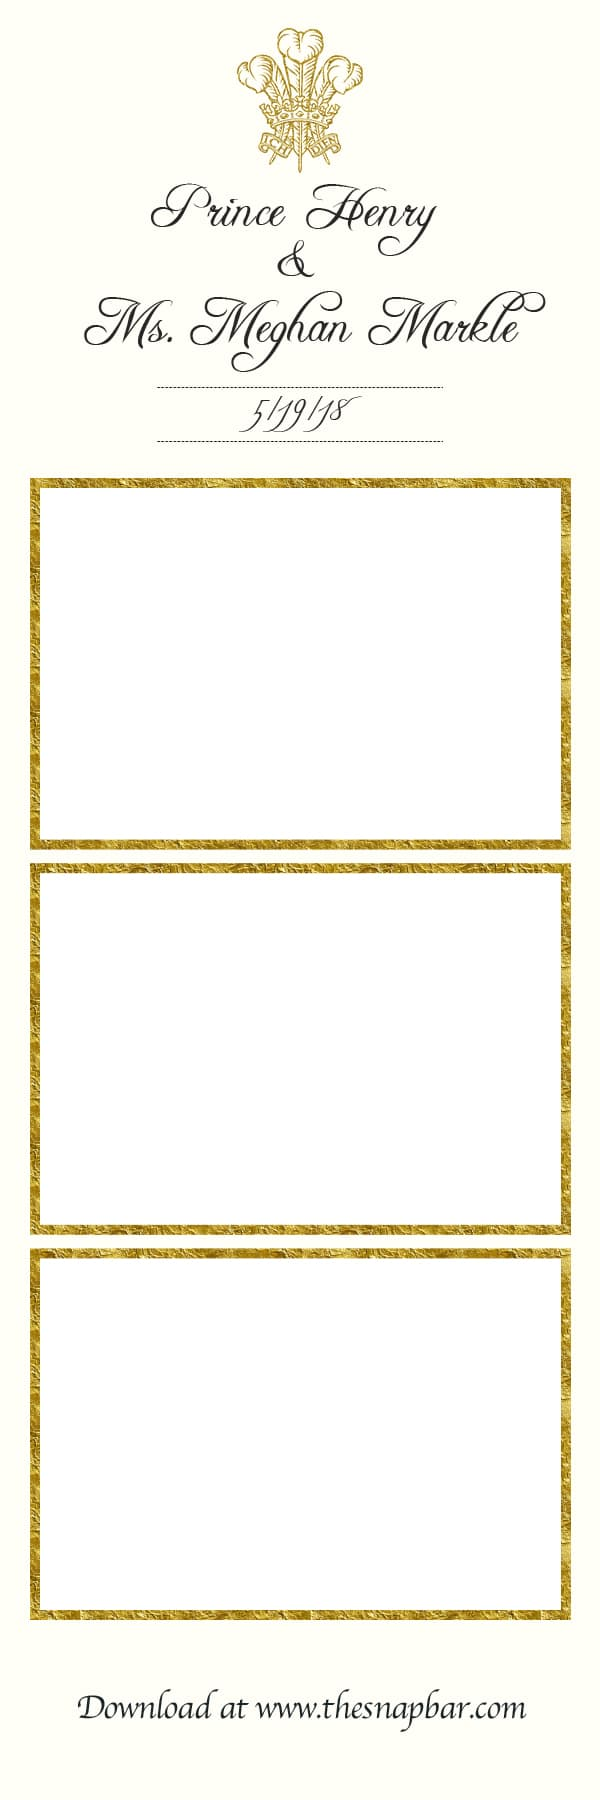 Royal Wedding Photo Booth Print Template